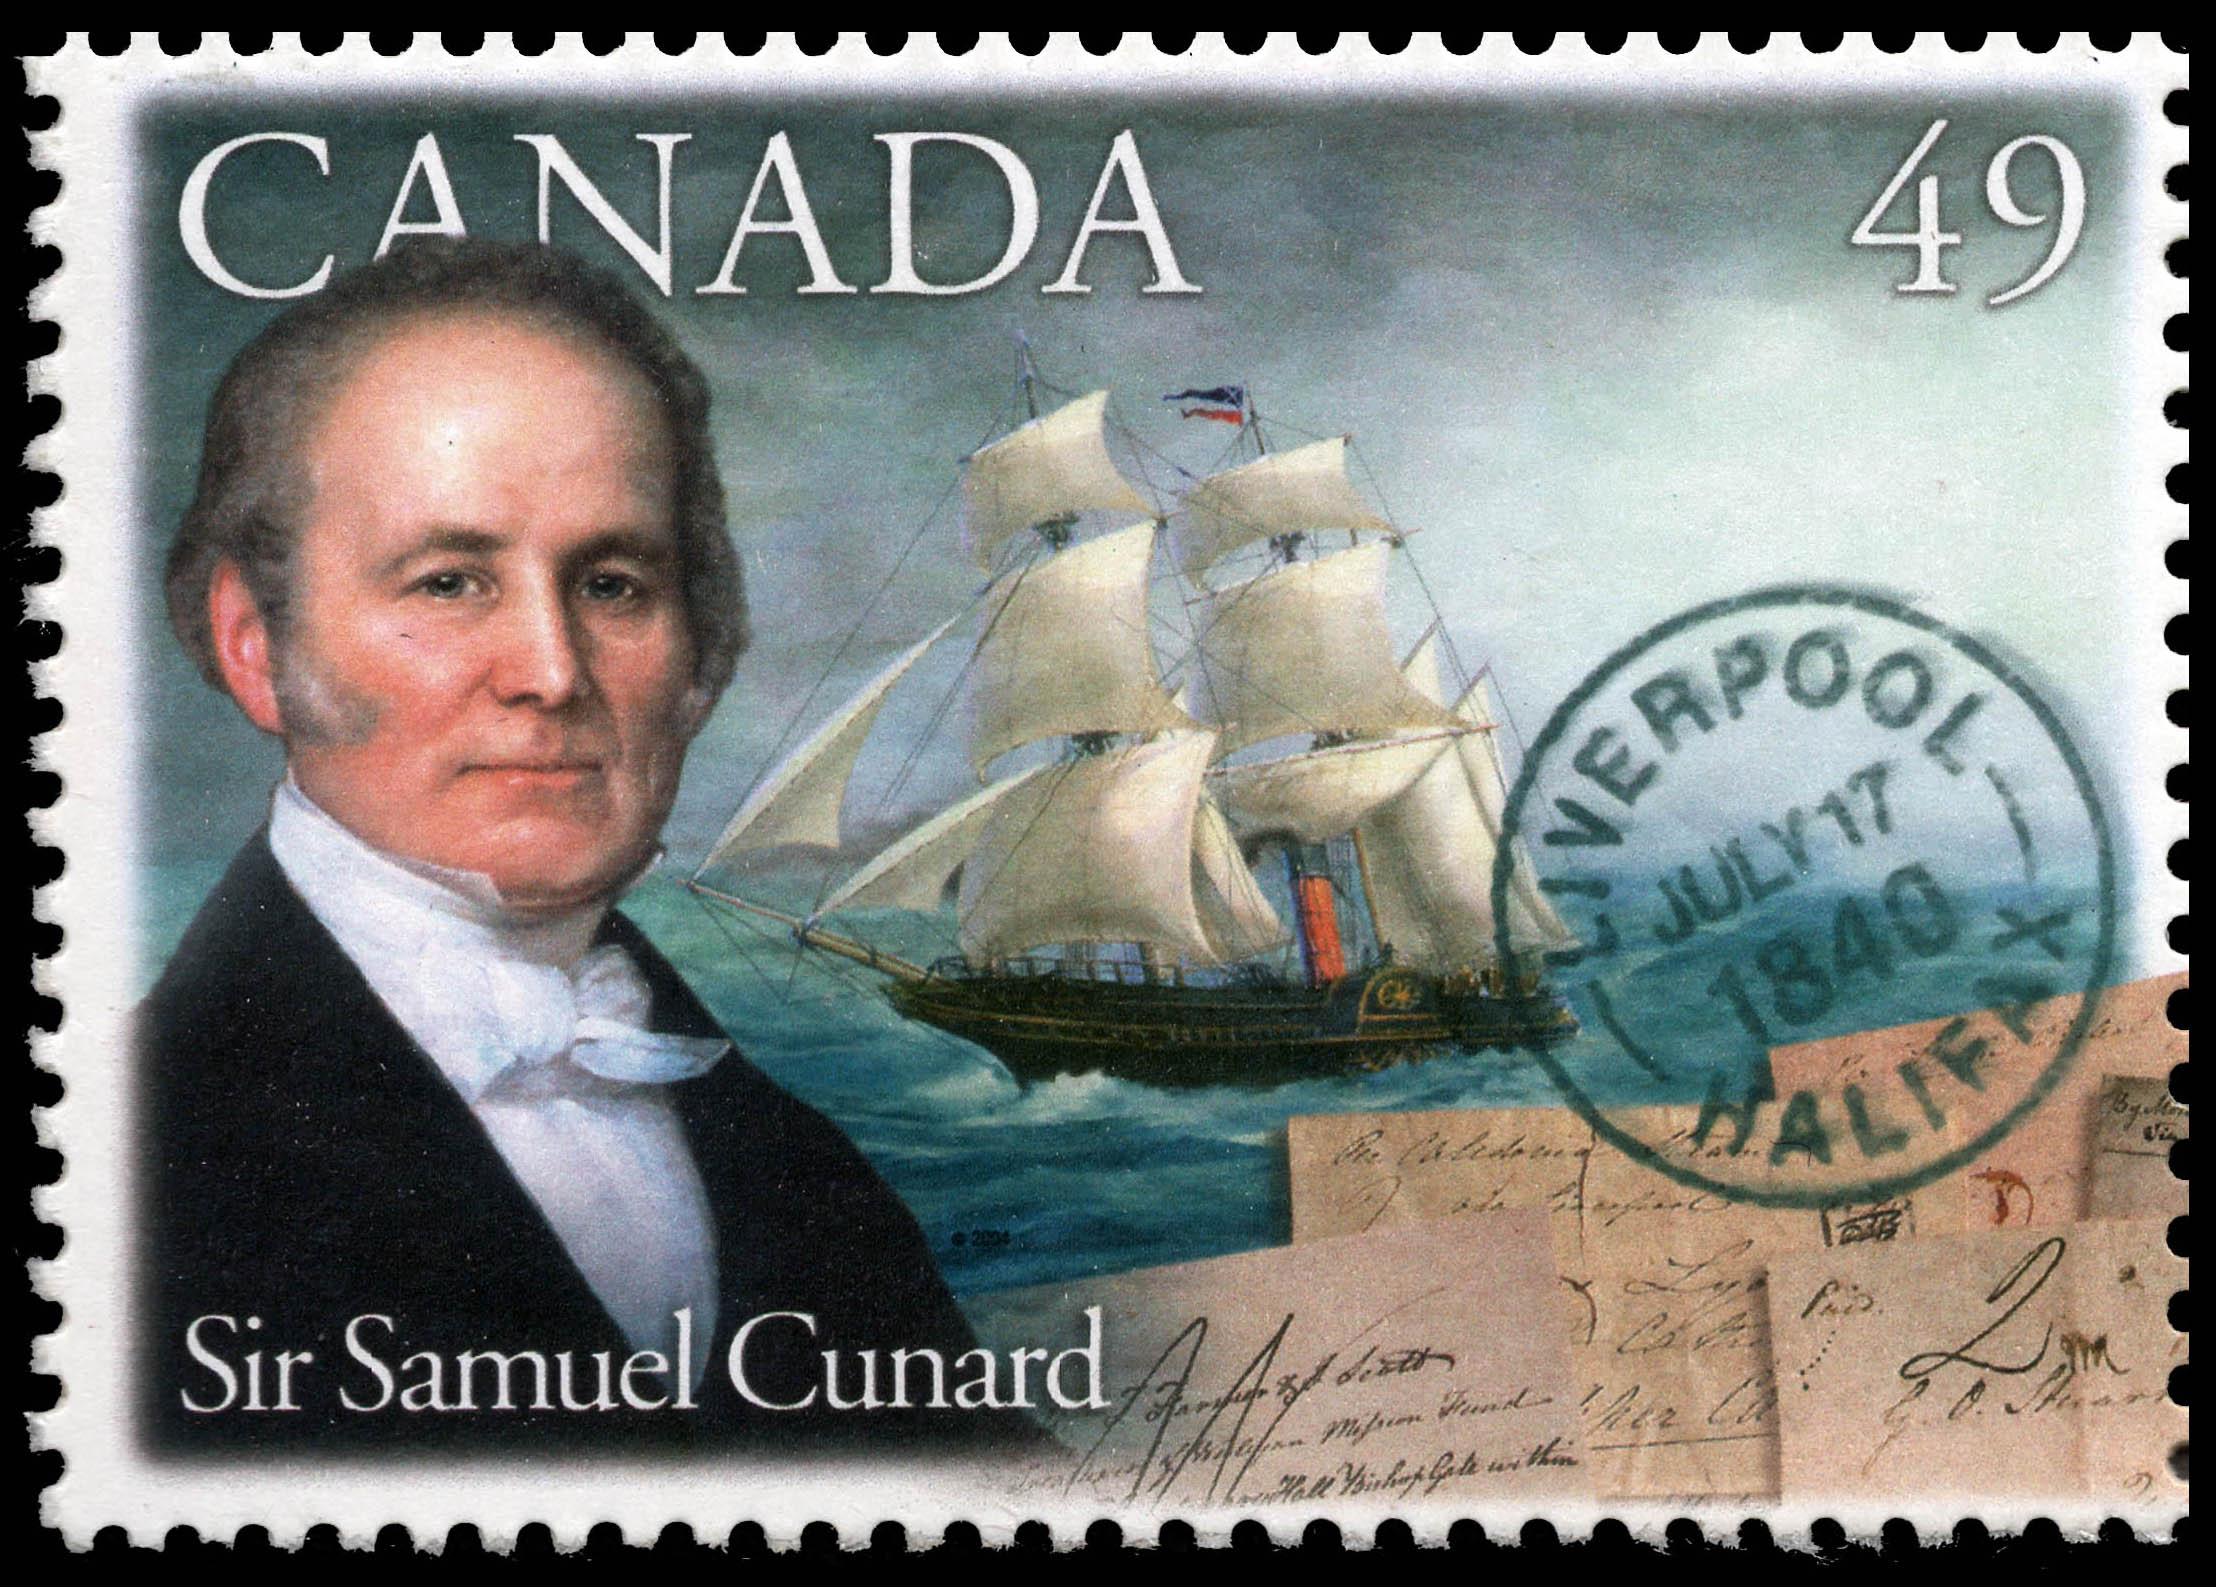 Sir Samuel Cunard Canada Postage Stamp | Pioneers of Transatlantic Mail Service